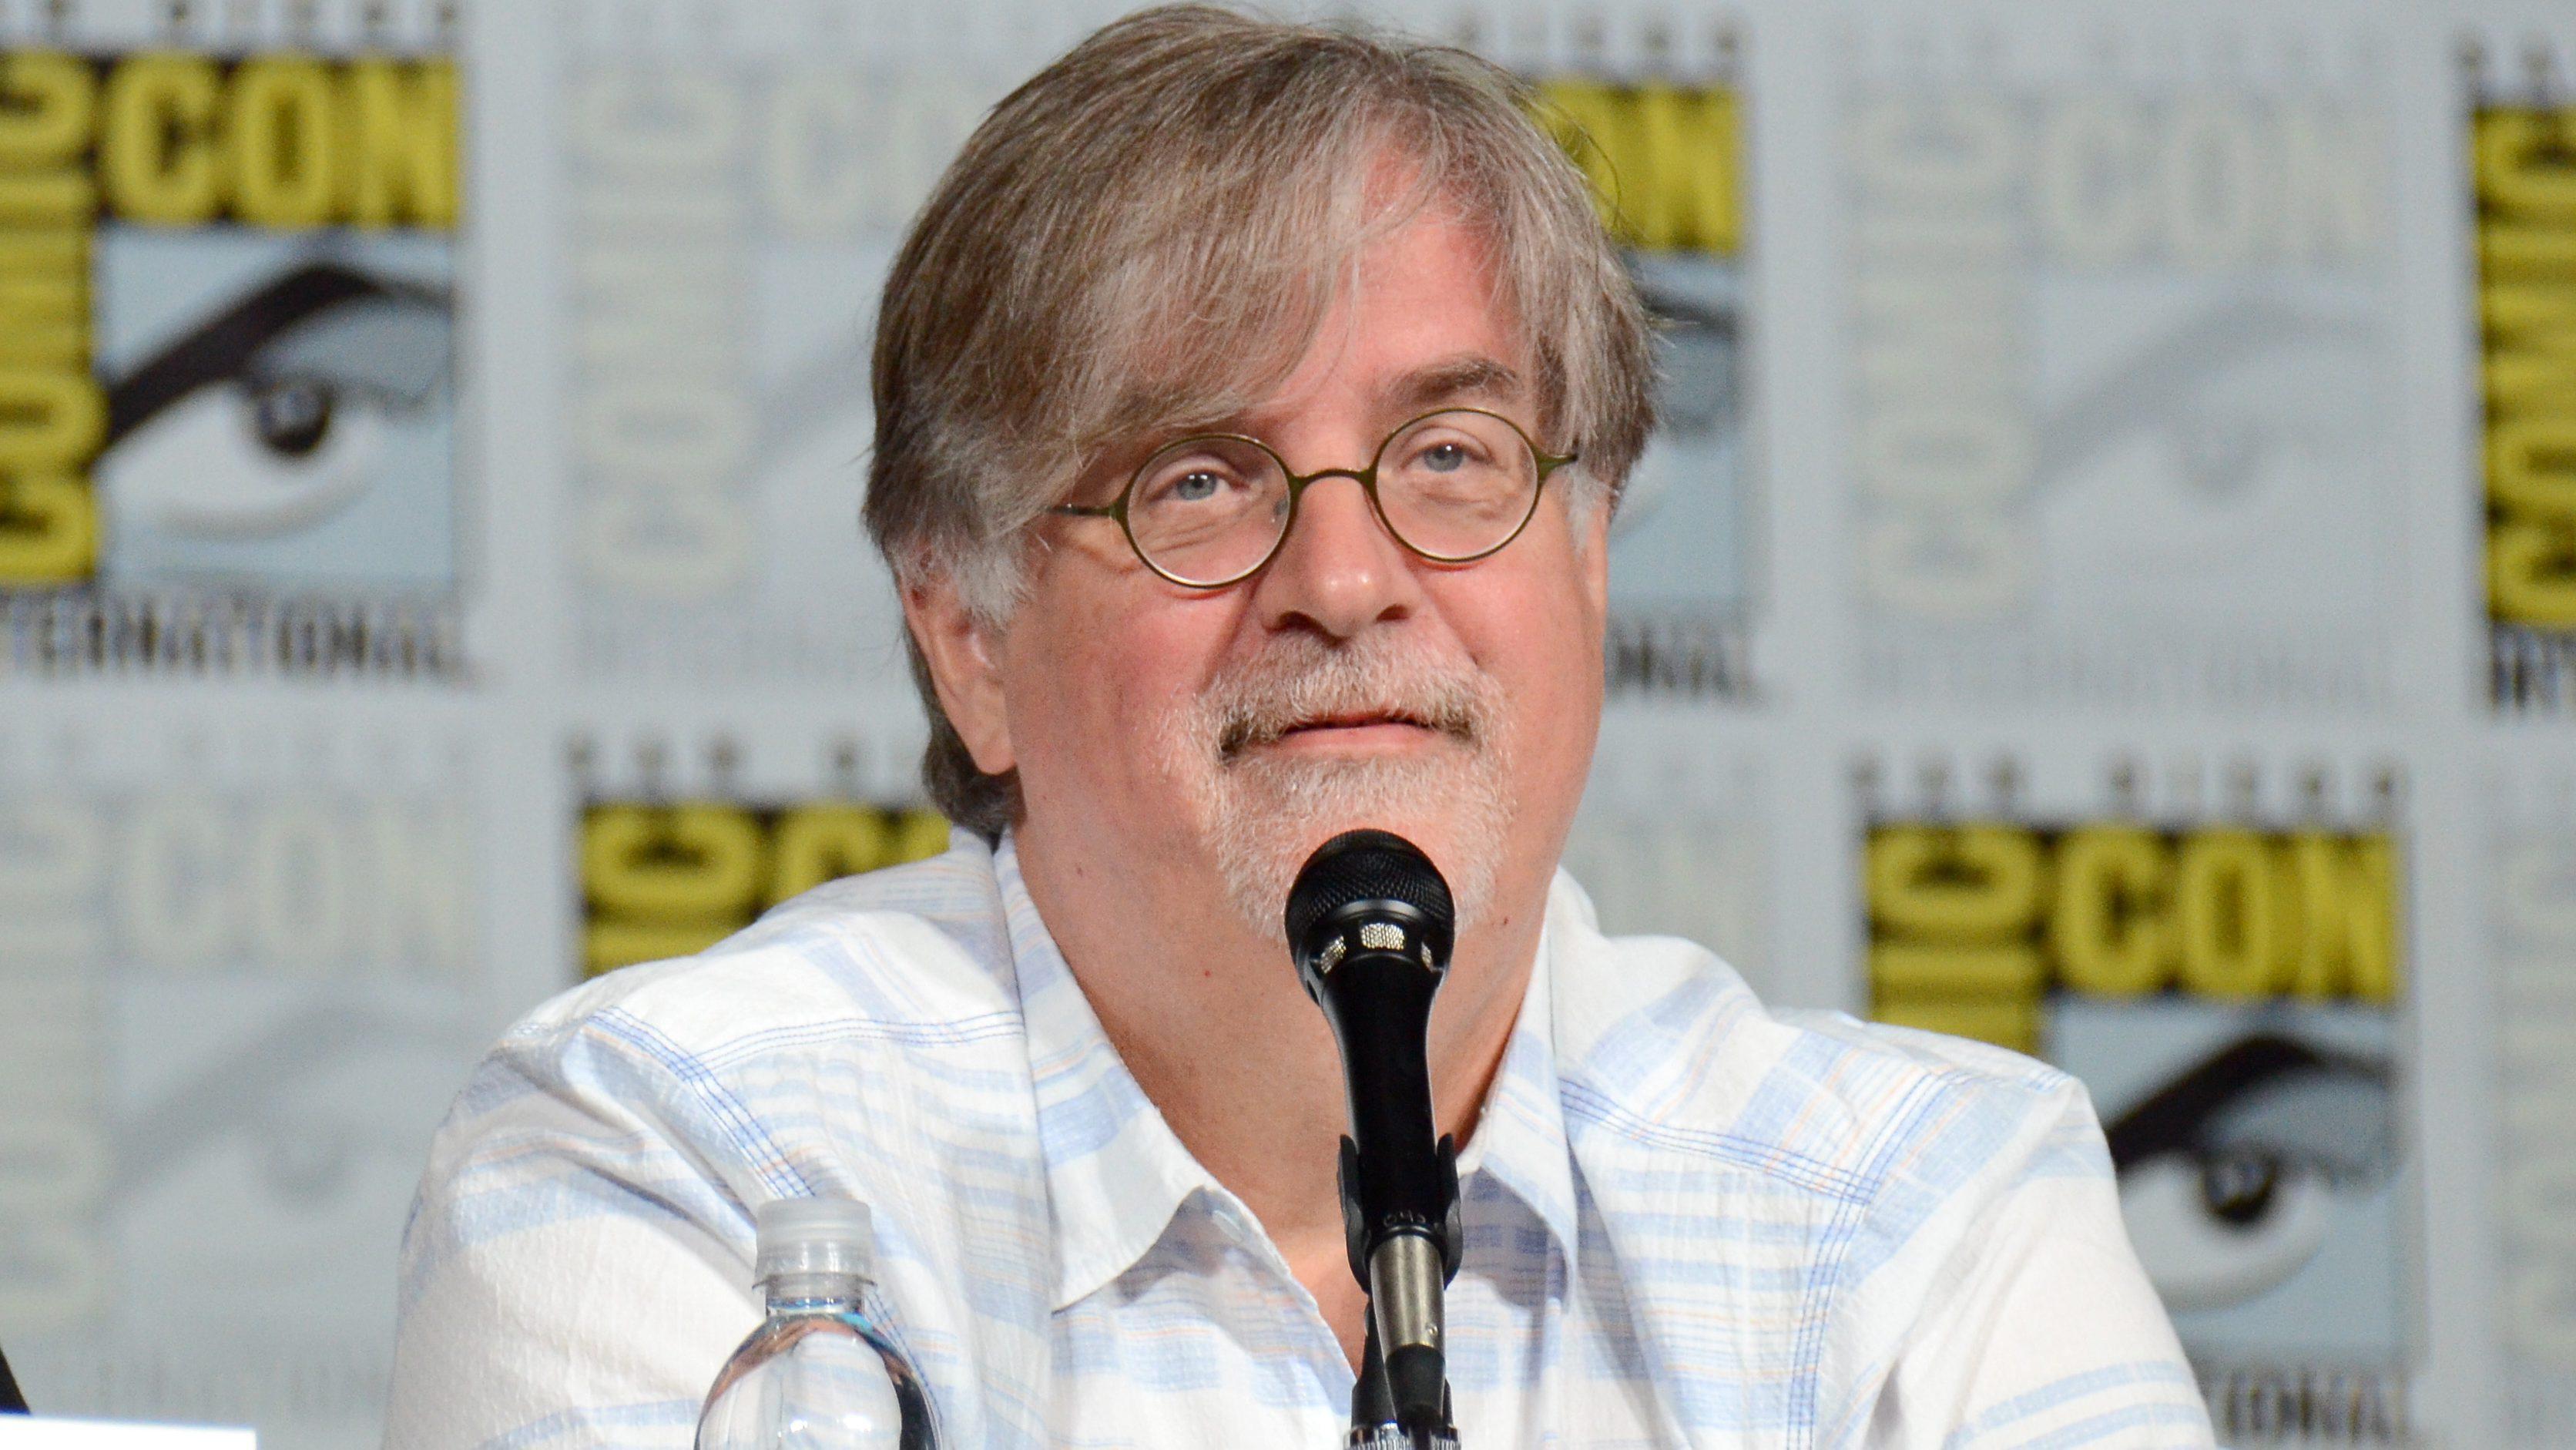 Matt Groening The Simpsons creator